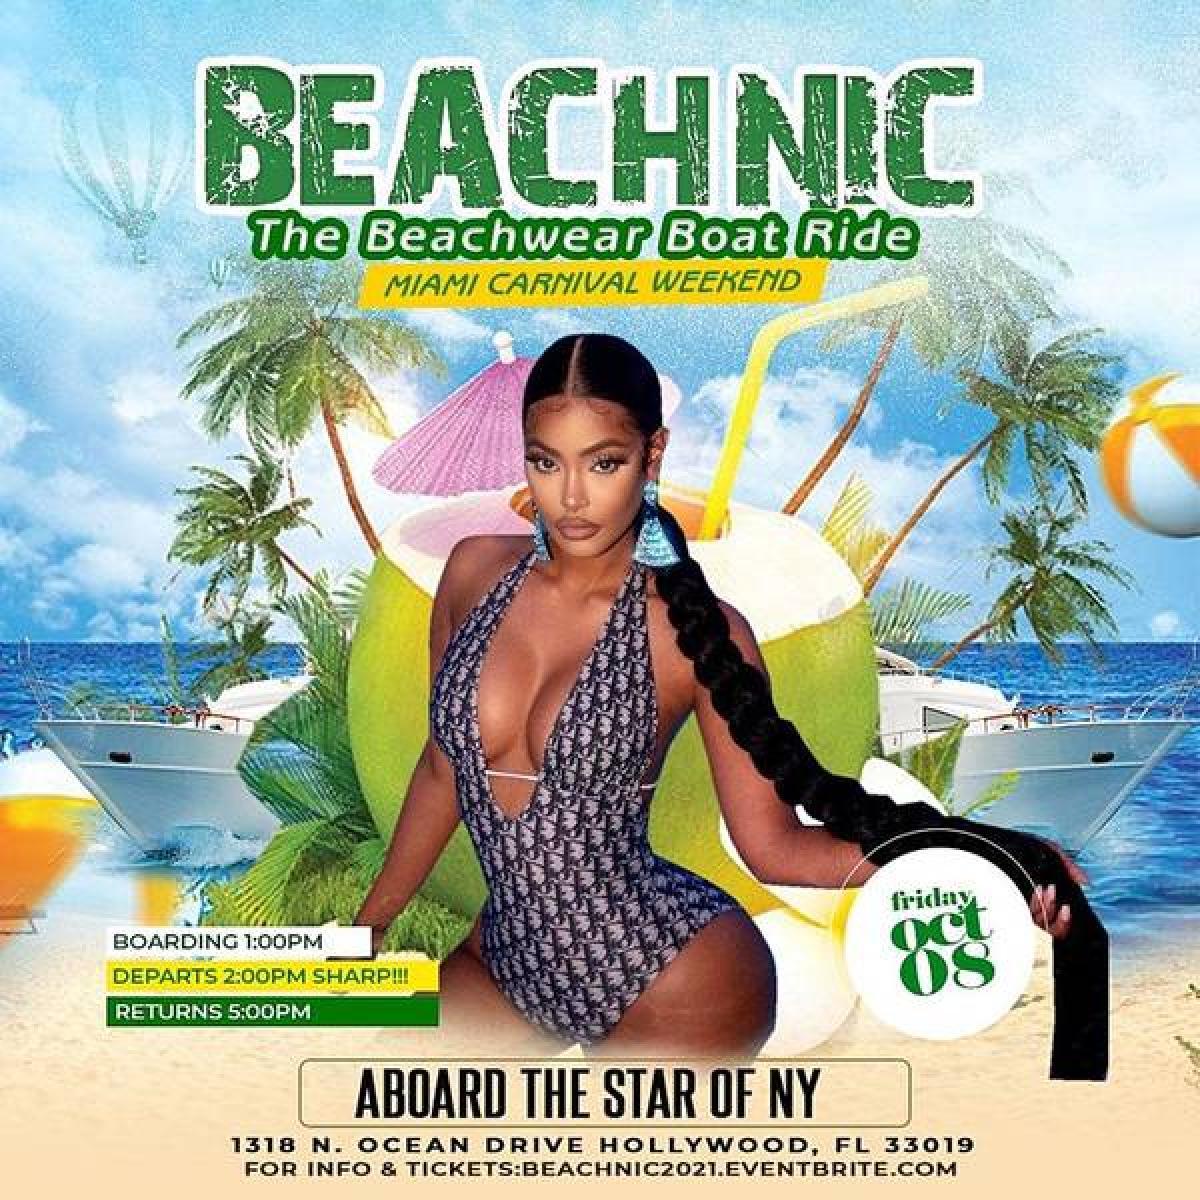 Beachnic: The Beachwear Boat Ride flyer or graphic.